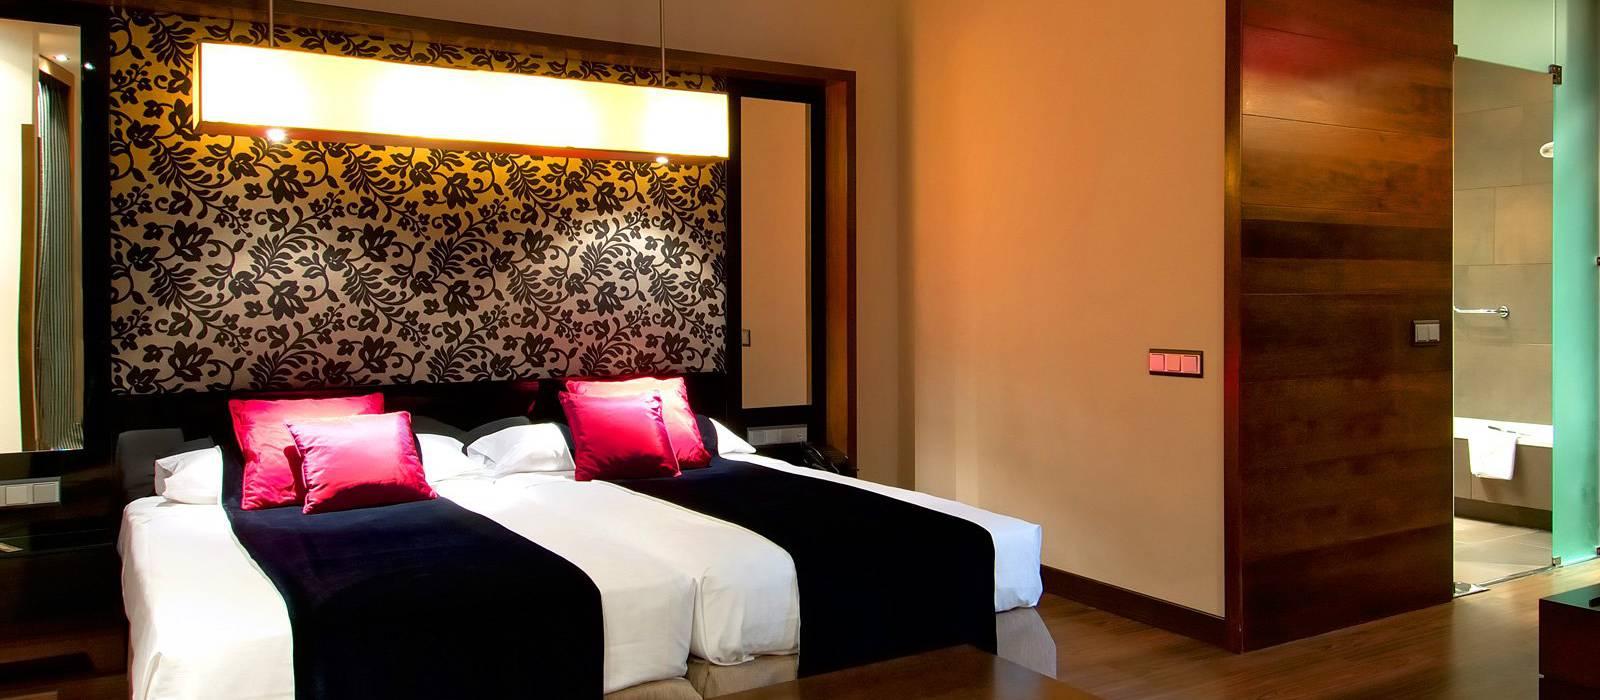 Offerte Soho Hotel Vincci Madrid - Soggiorna 3 notti e risparmia!